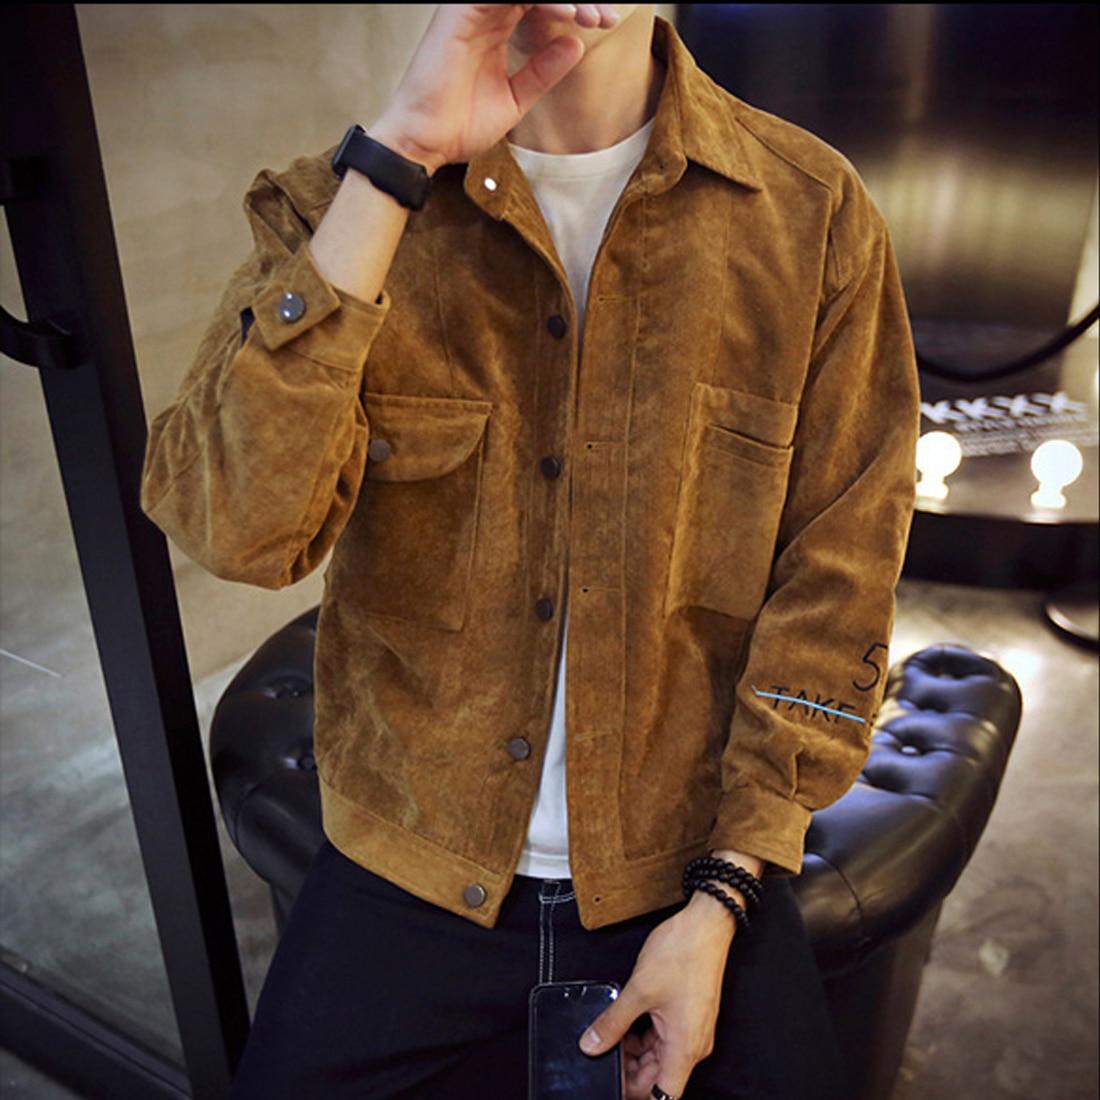 2019 Spring Autumn Hot Corduroy Jackets Men Long Sleeve Turn Down Collar Slim Solid Bomber Jacket Gray Brown Khaki Outwear Coats